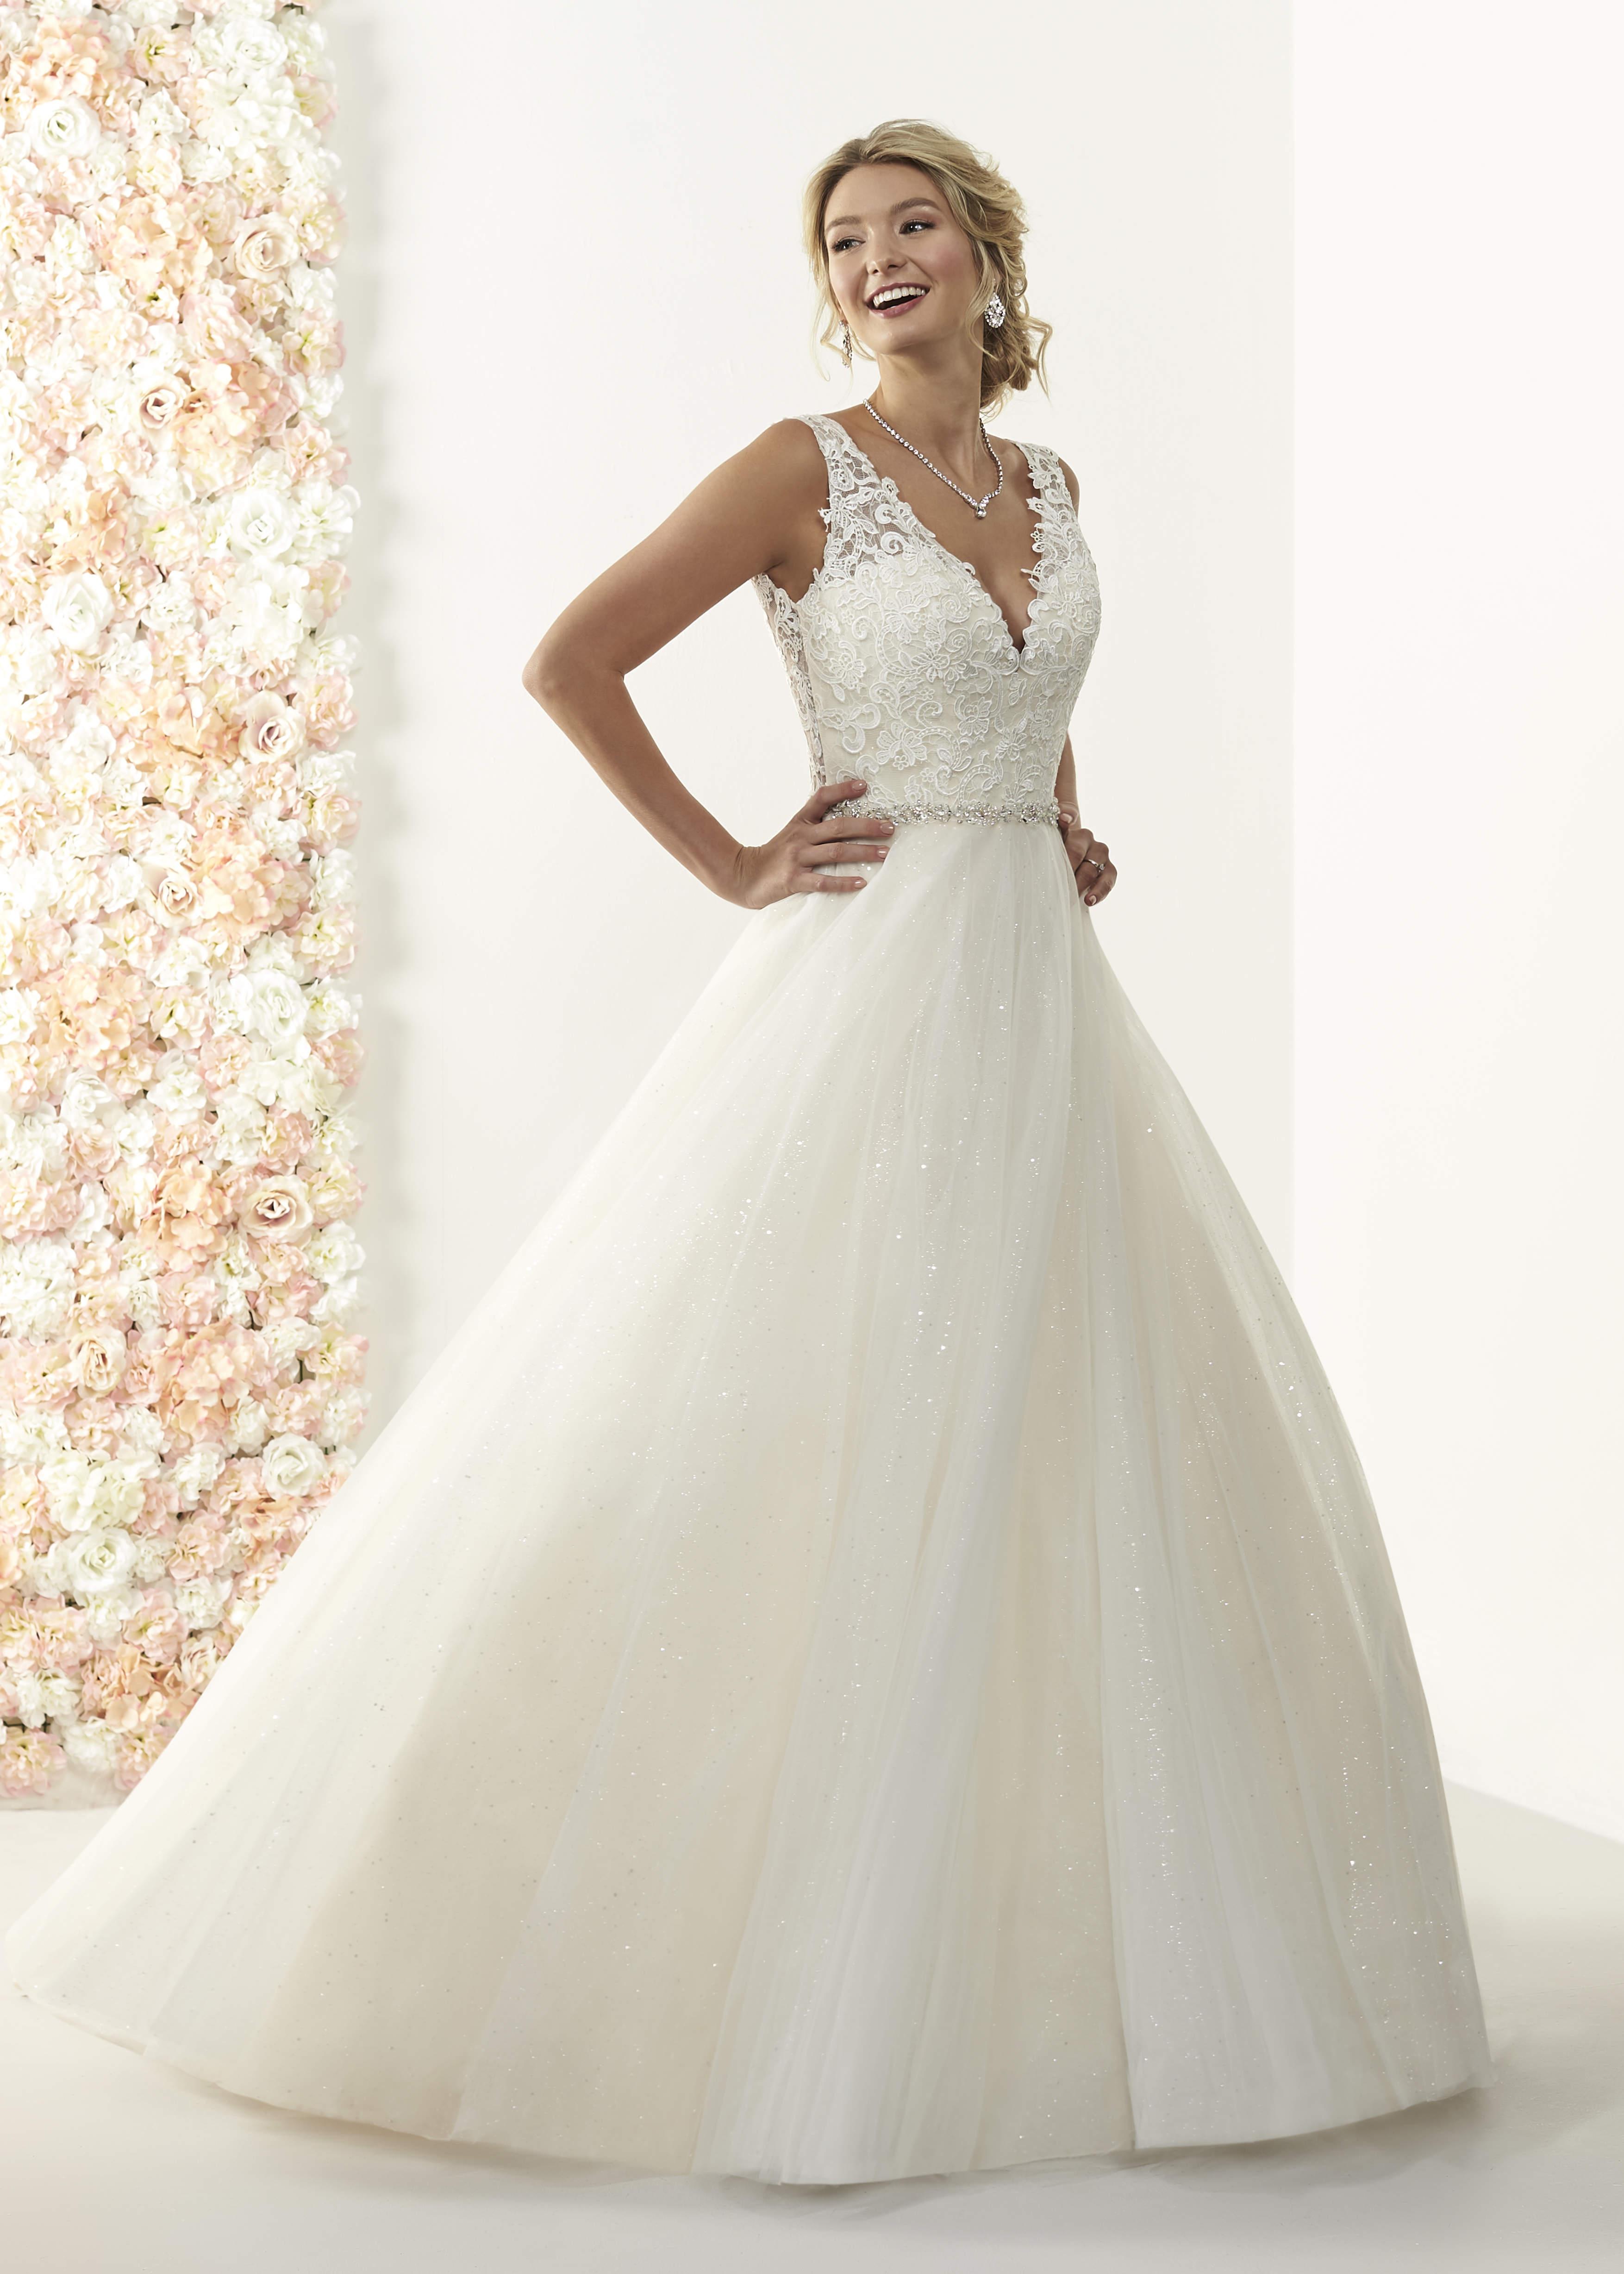 0a939ecf4c A gorgeous ballgown style